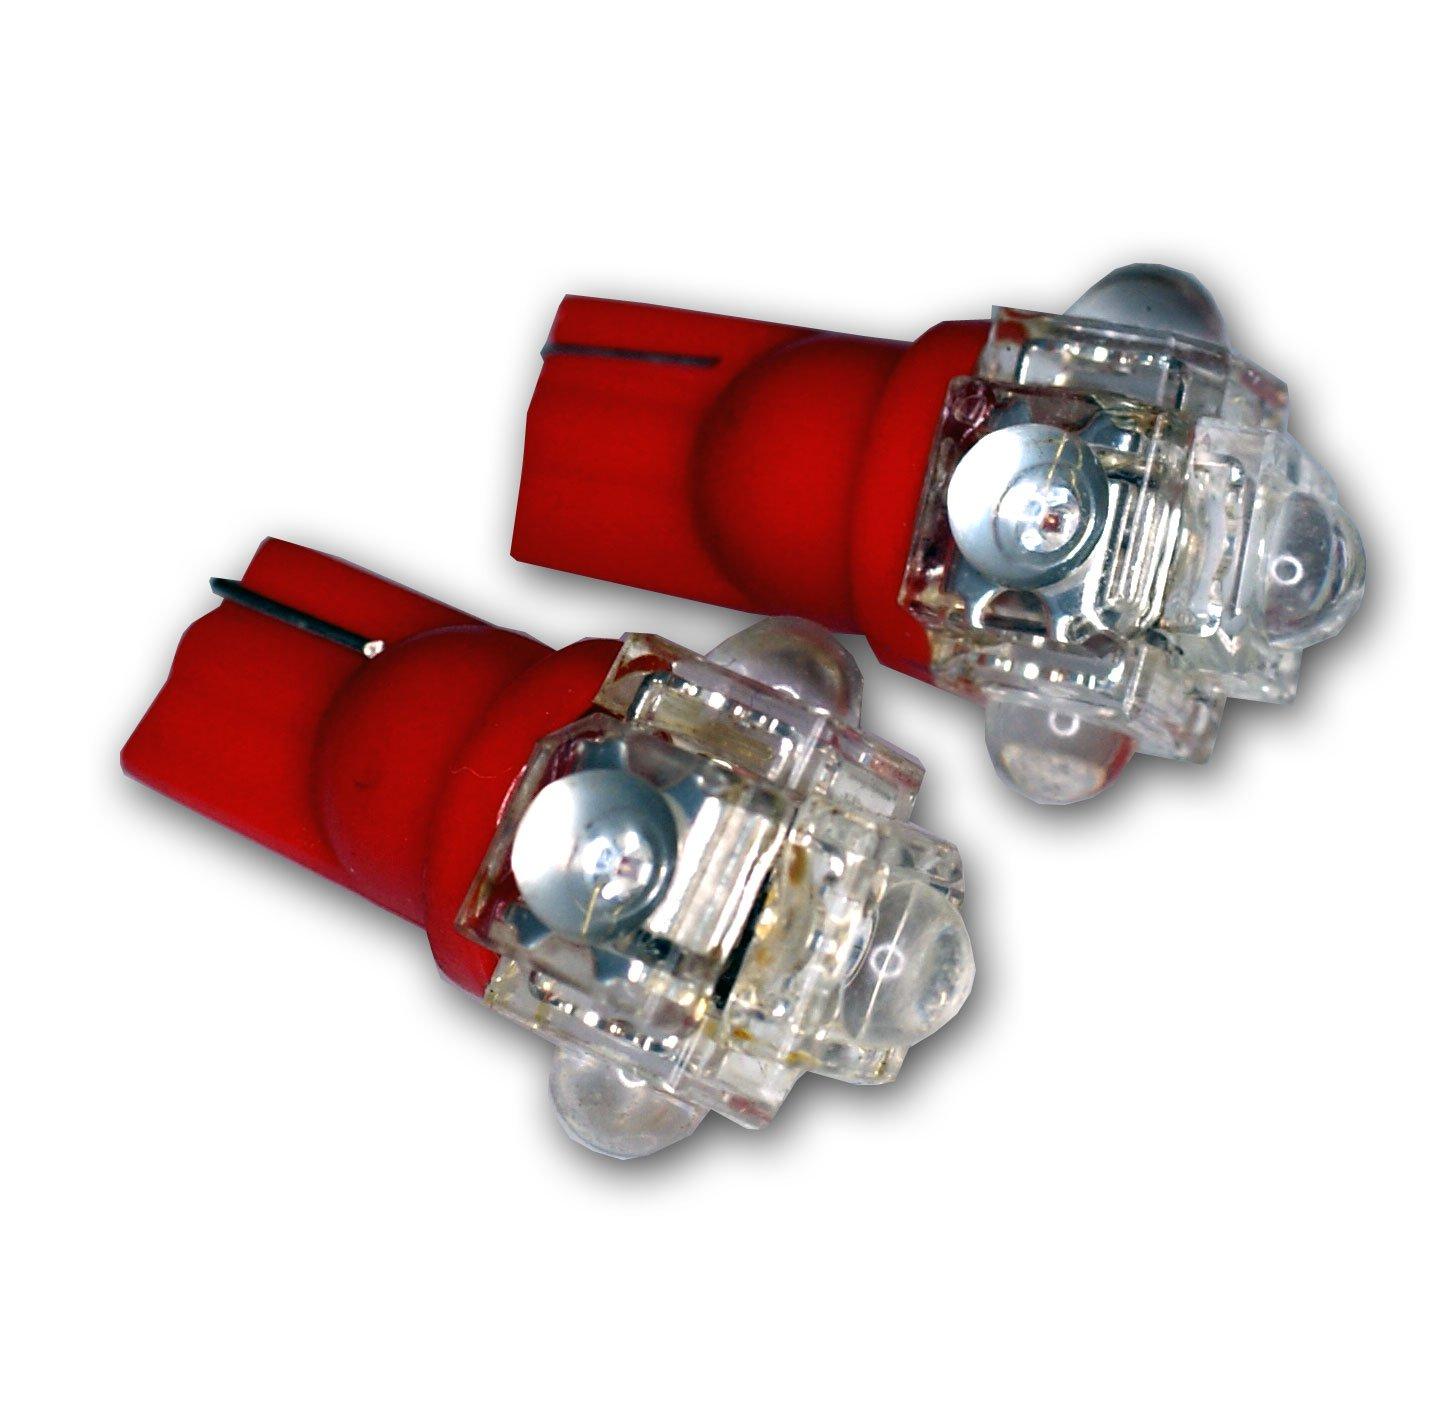 TuningPros LEDTL-T10-R5 Tail Light LED Light Bulbs T10 Wedge, 5 Flux LED Red 2-pc Set